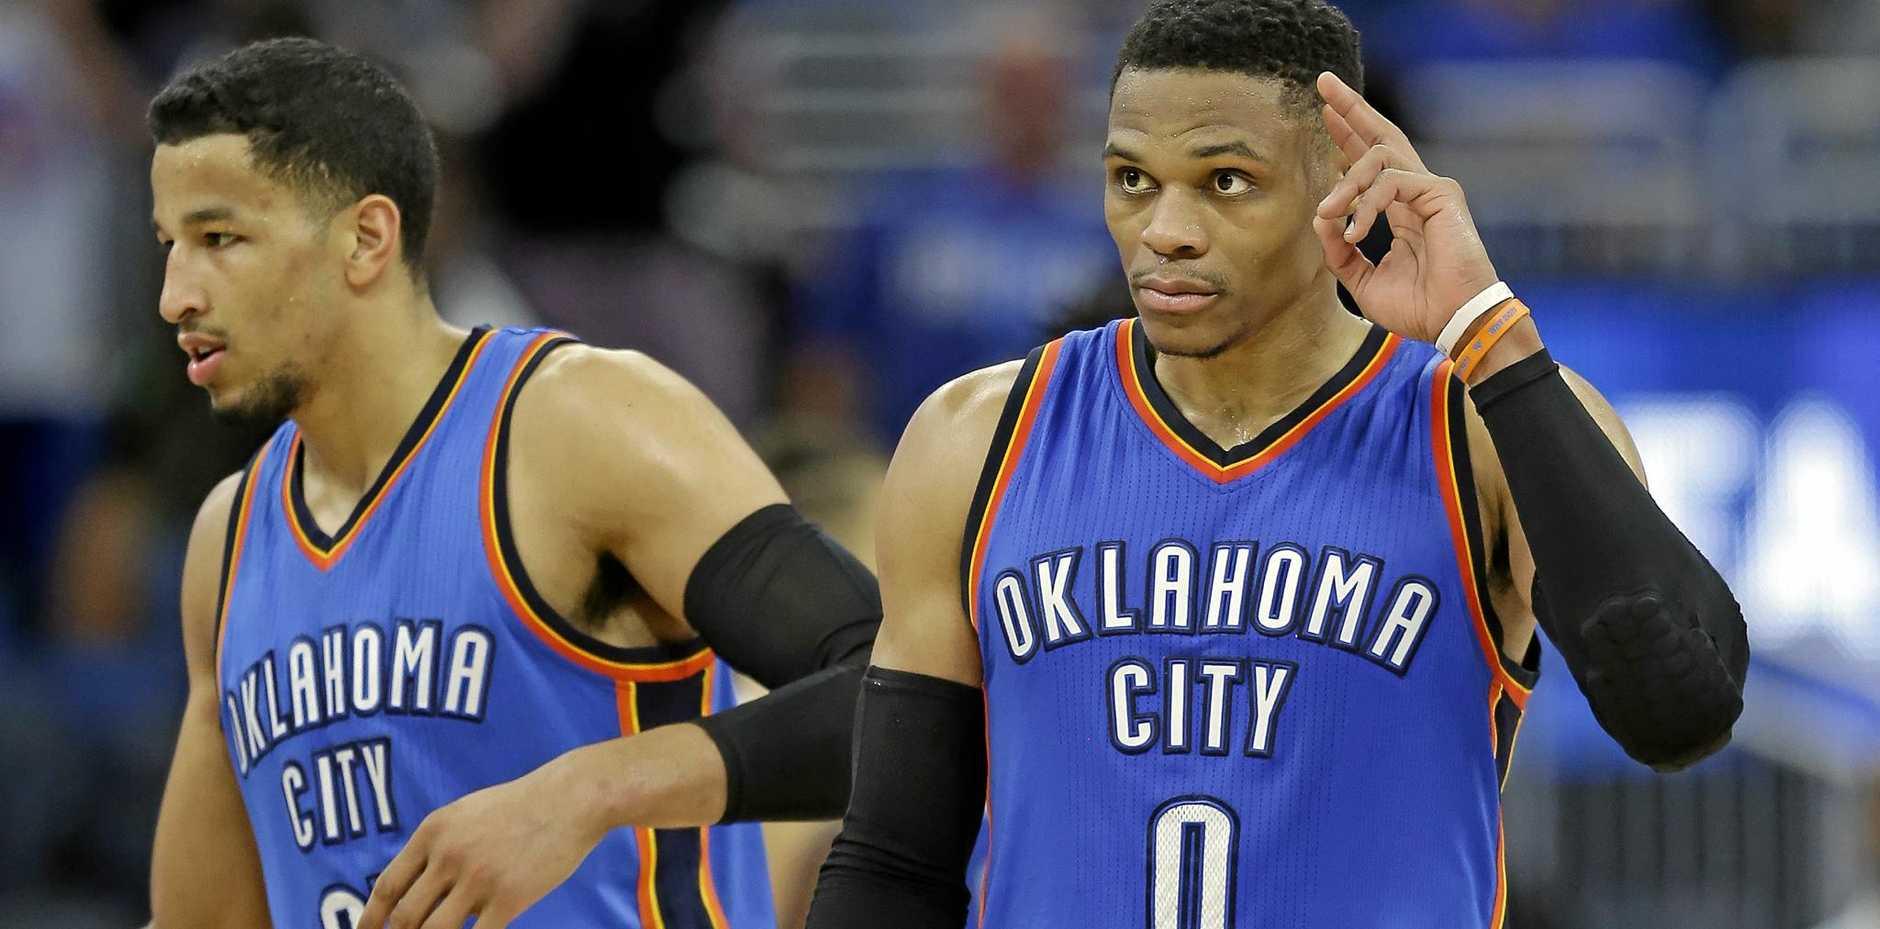 MAIN MAN: Oklahoma City Thunder's Russell Westbrook has been named 2017 NBA MVP.